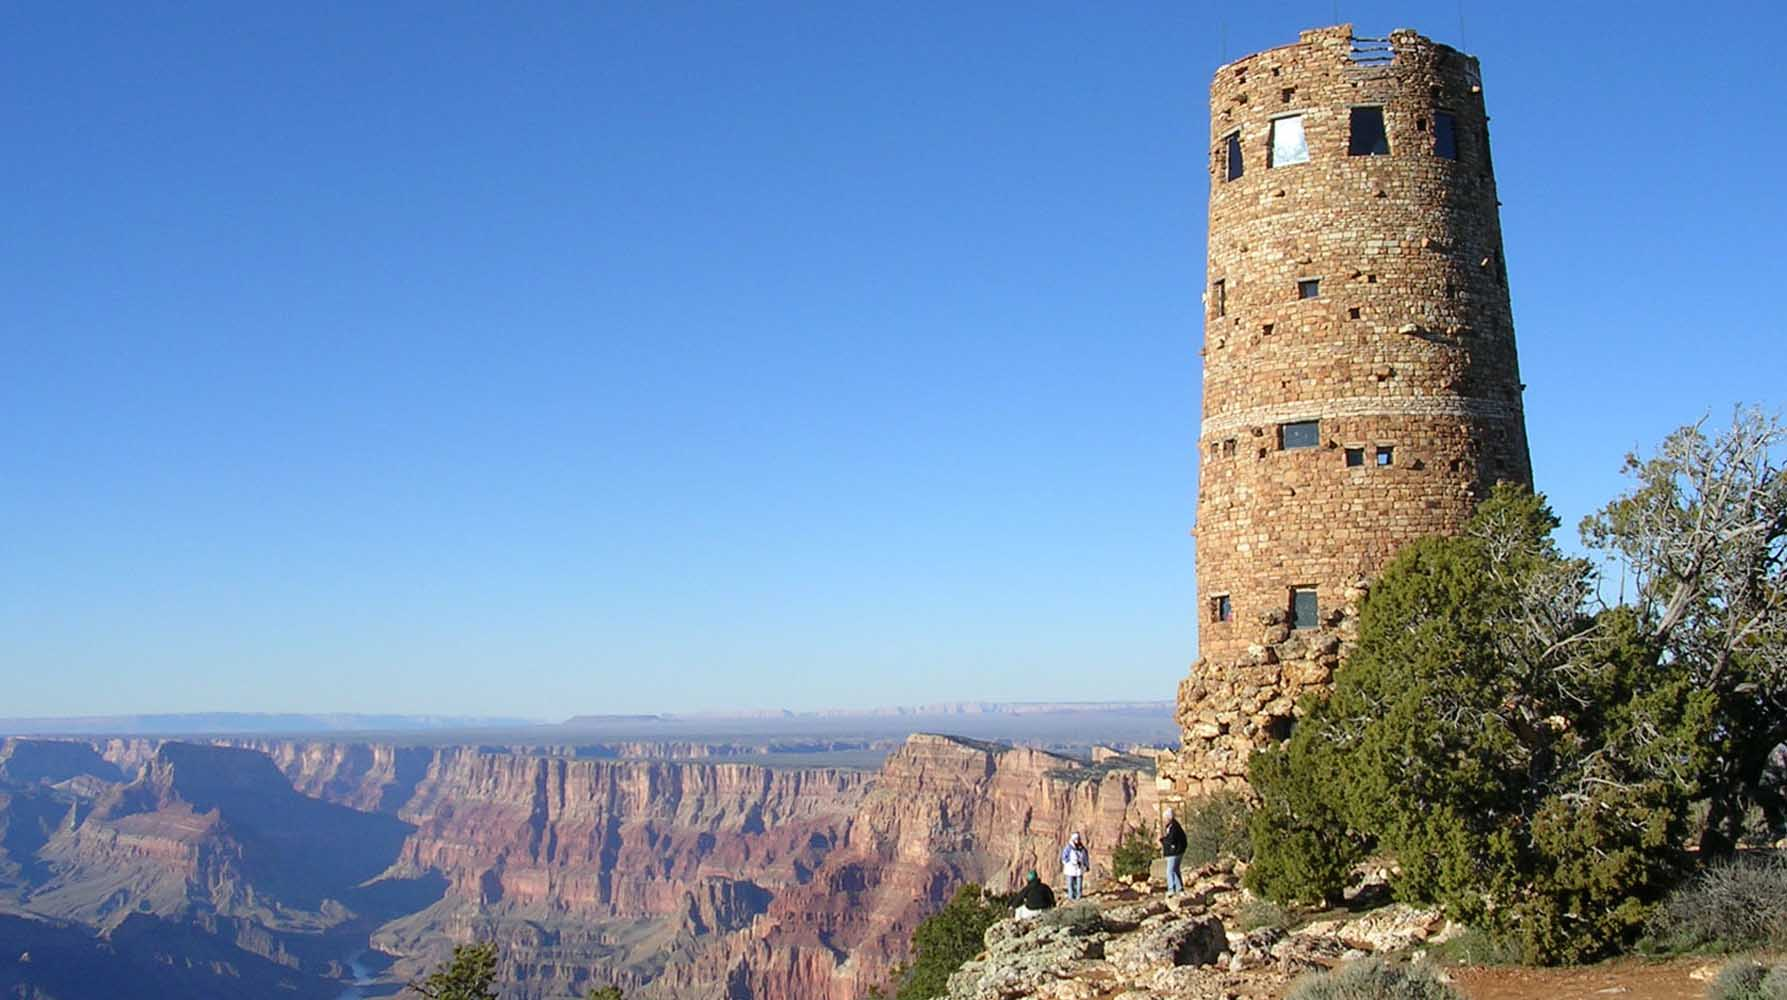 voyage, chinook, zion, tower, grand canyon, chinook, bryce canyon, voyage, travel, trek, randonnee, paria canyon, las vegas